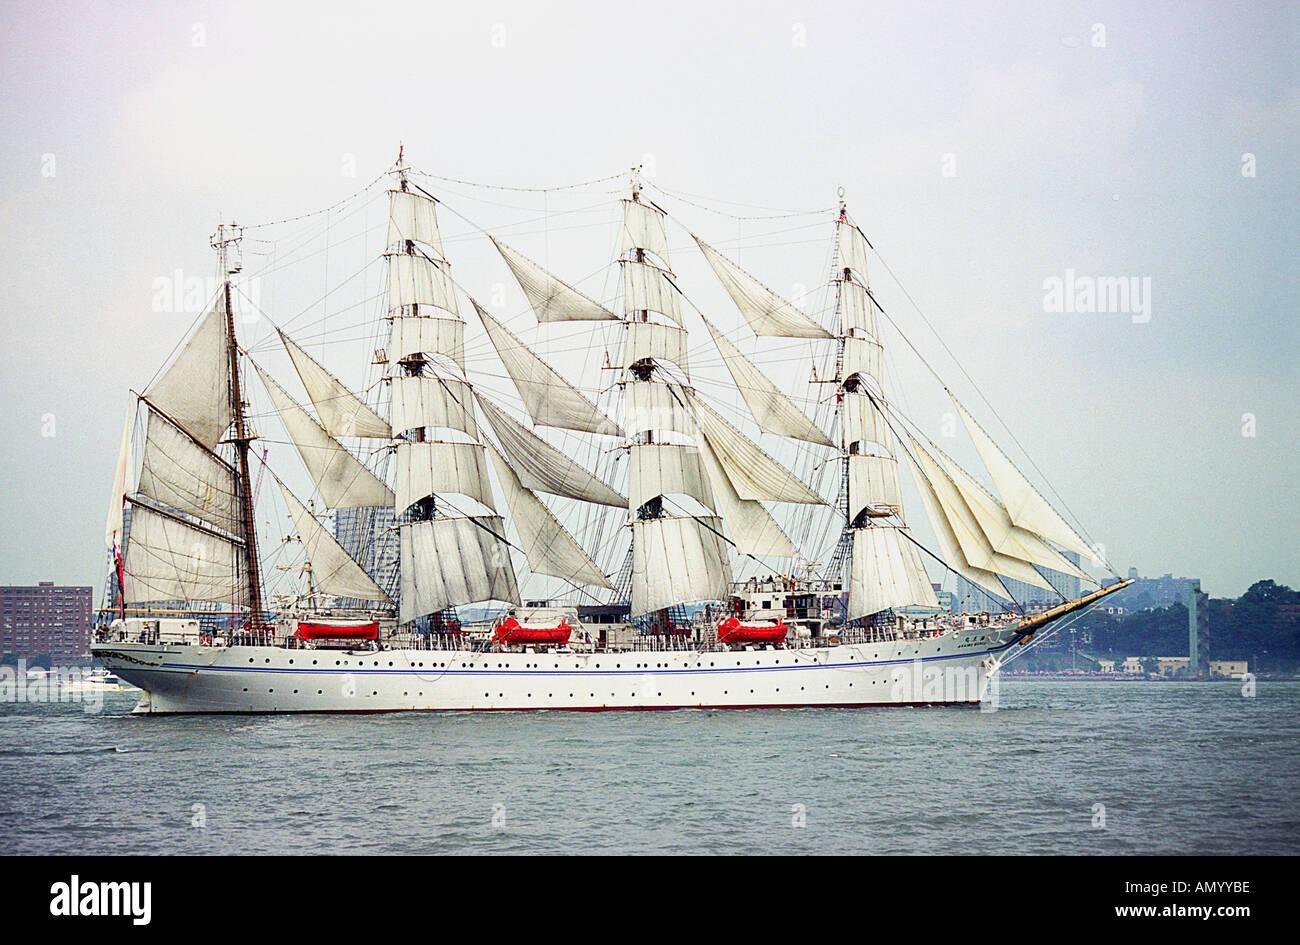 Tall Ship Japanese Bark Kaiwo Maru New York City Hudson River - Stock Image